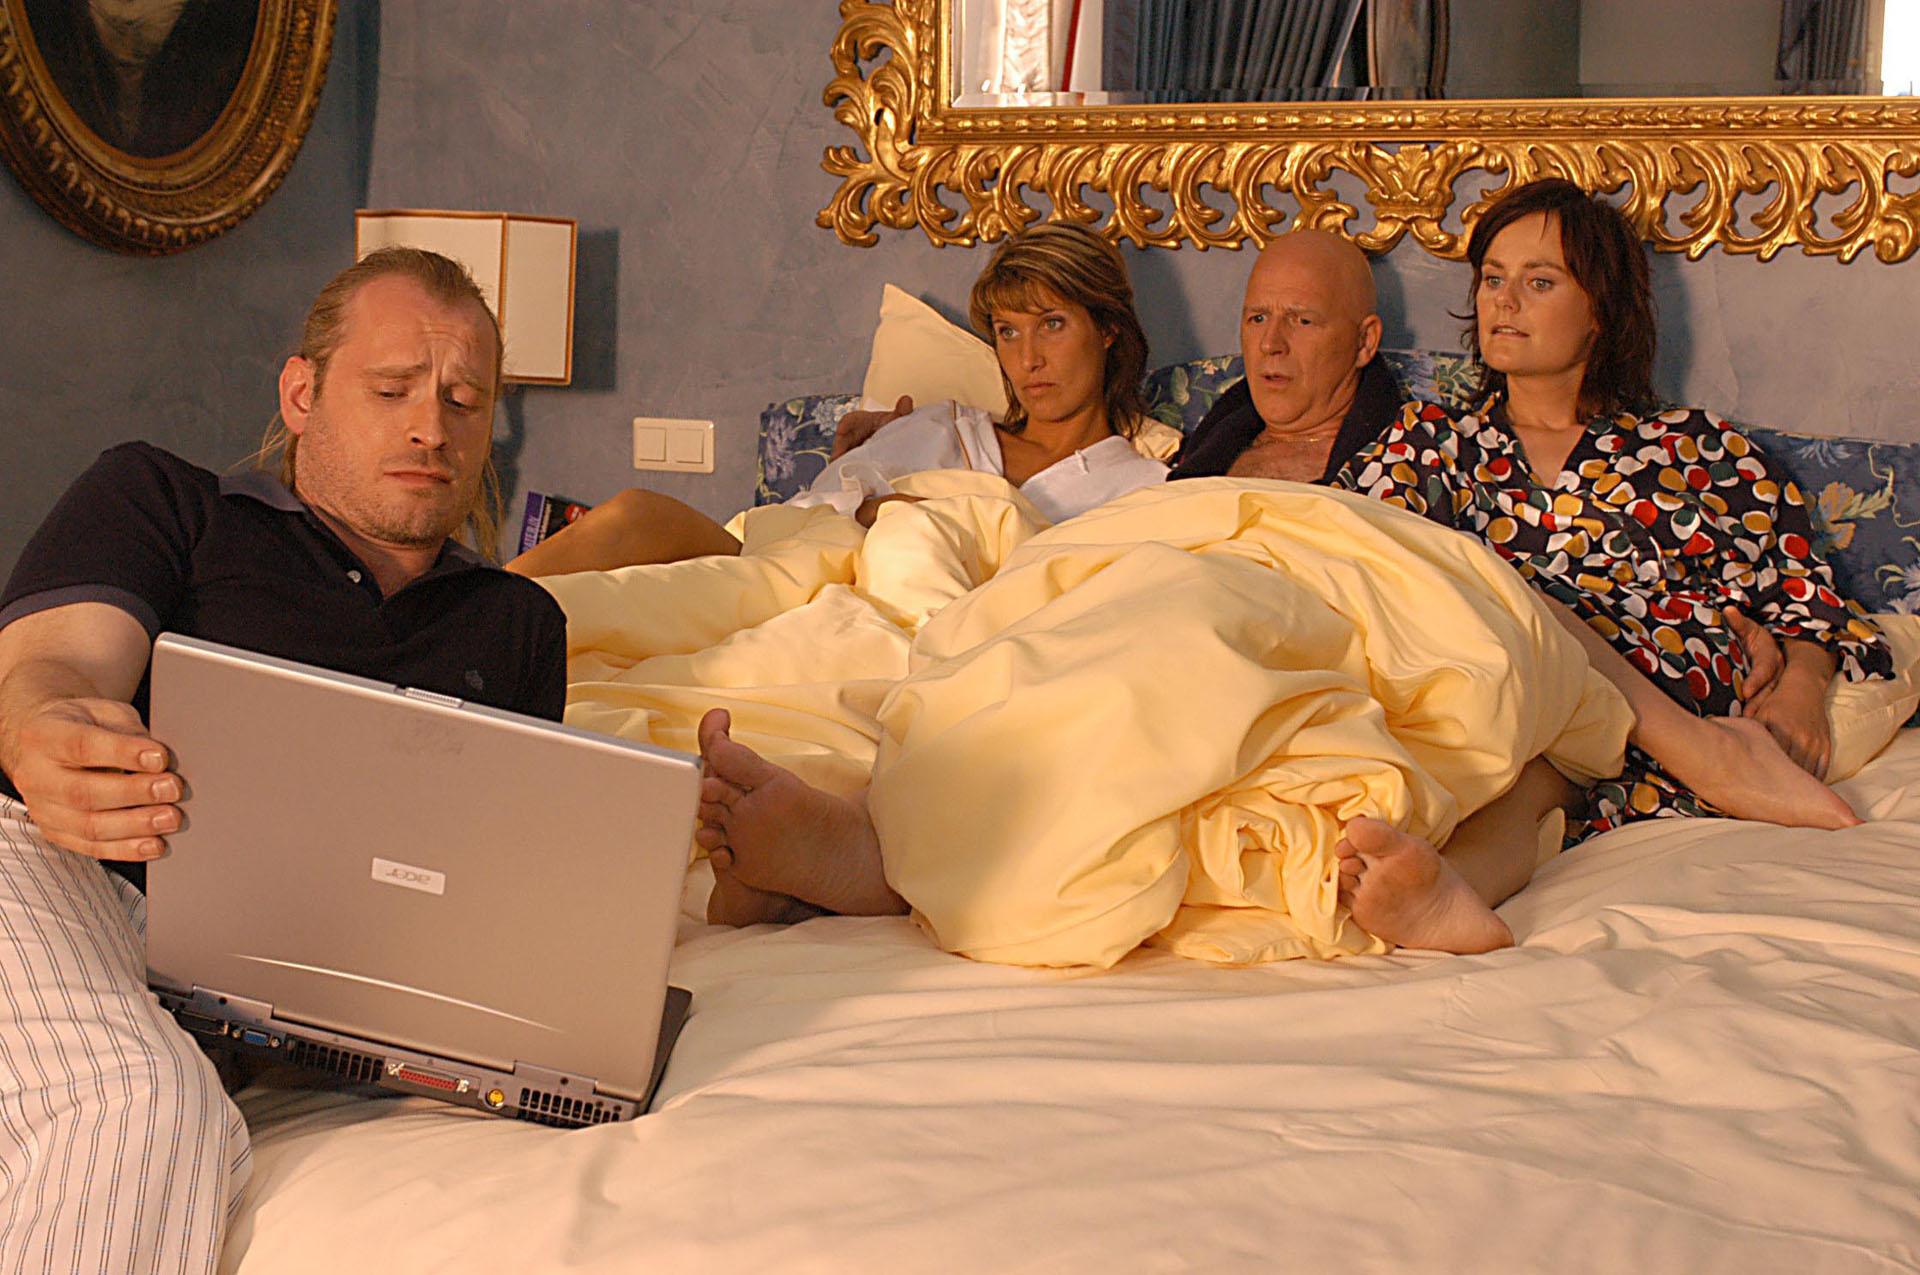 © ORF / Hubert Mican (Star*Film) - Johannes Krisch, Ina Nadine Wagler, Alexander Goebel, Nina Blum